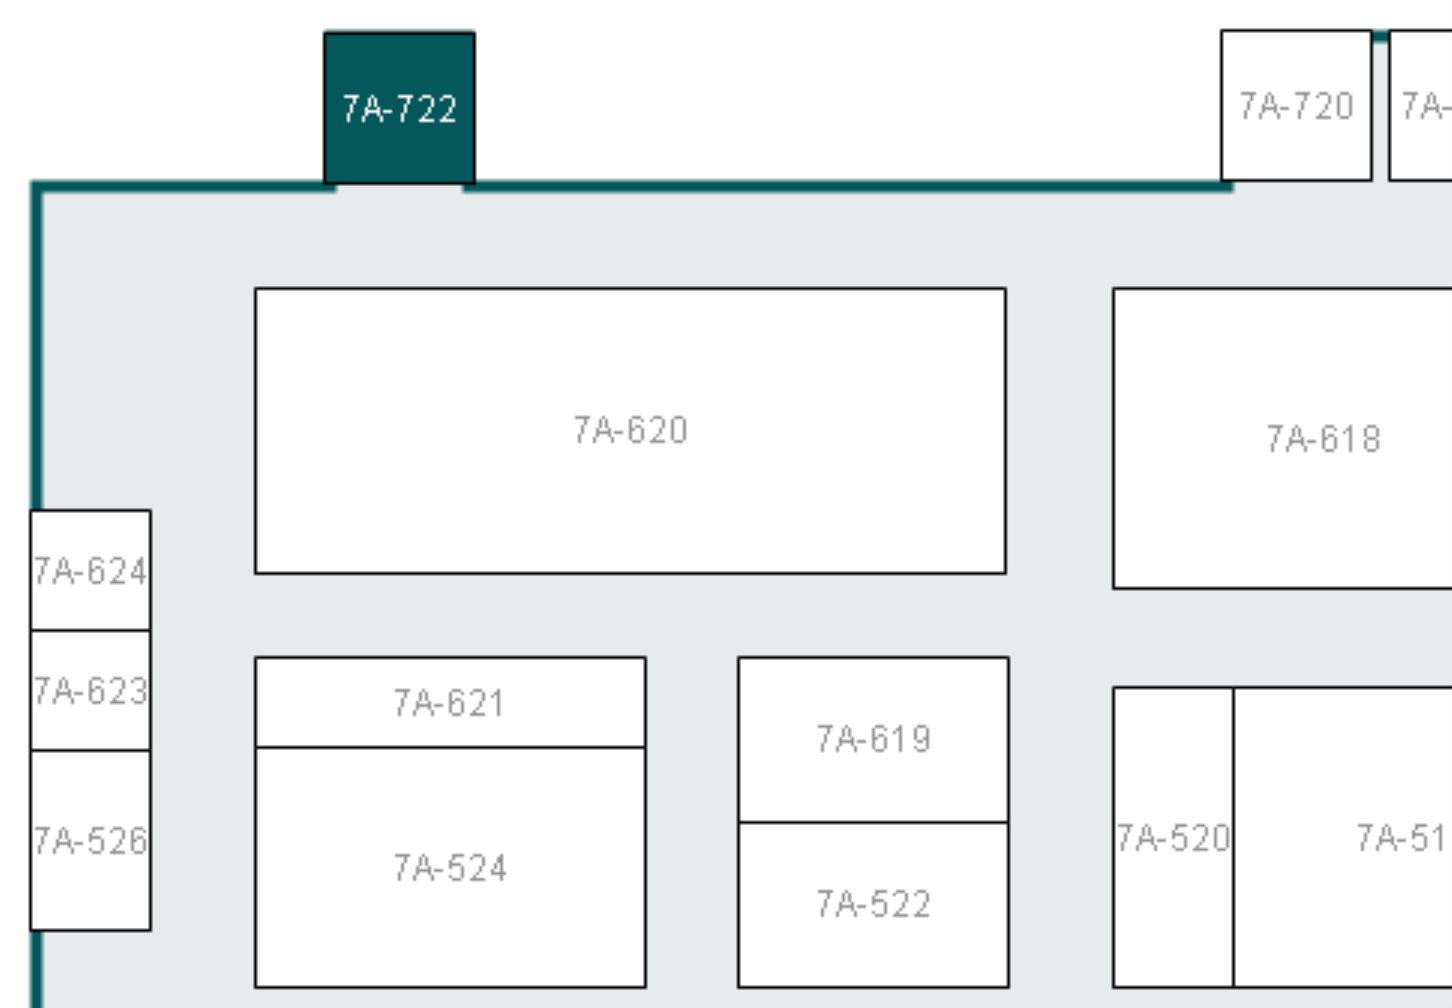 7A / 7A-722